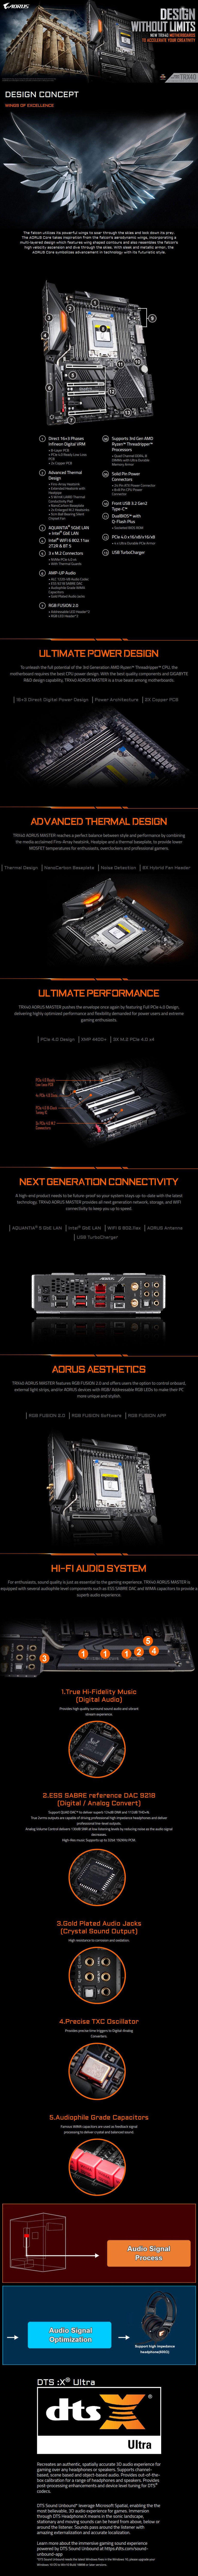 gigabyte-trx40-aorus-master-rgb-strx4-eatx-motherboard-ac29201-2.jpg